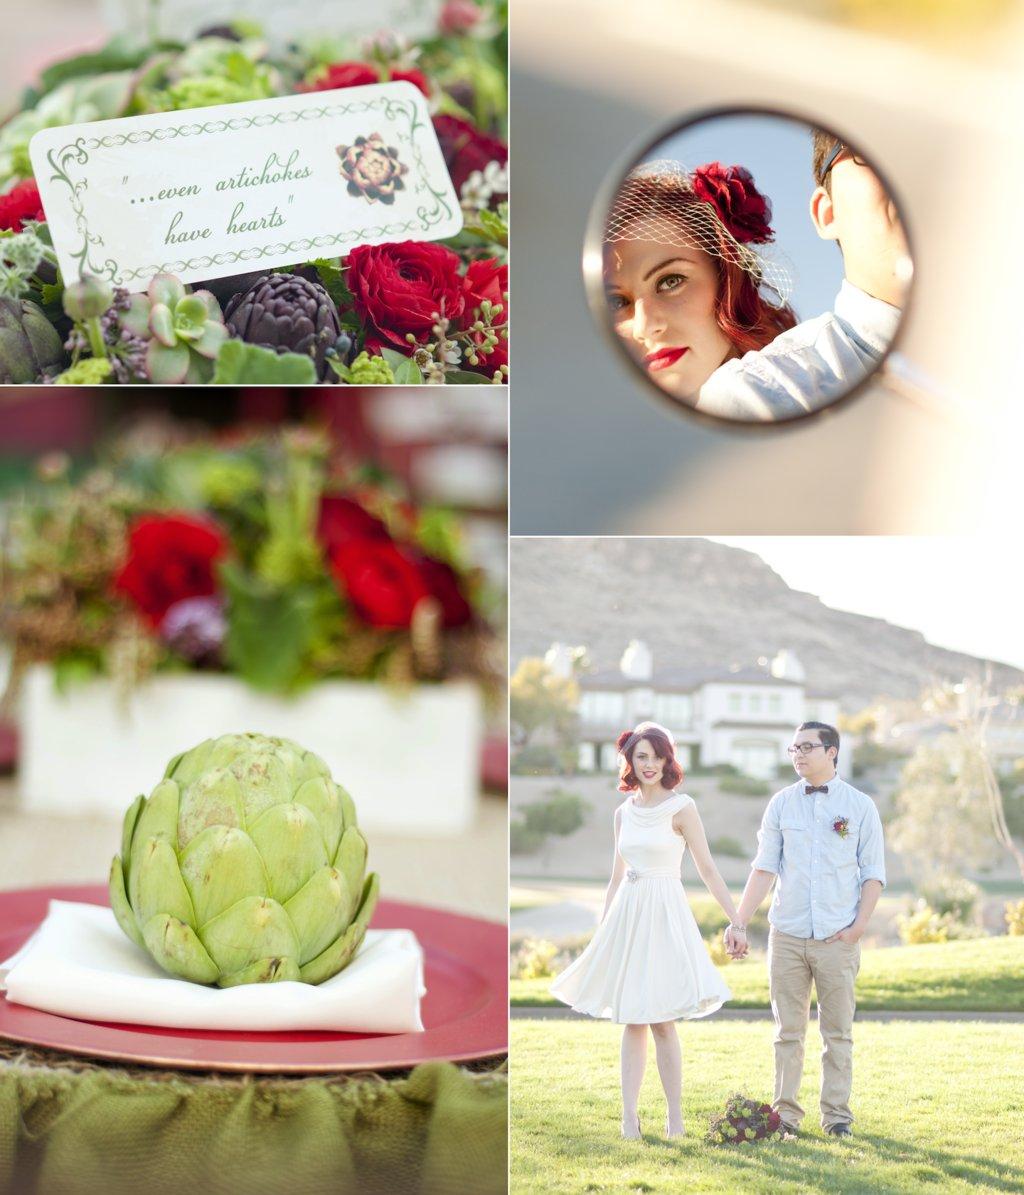 French-inspired-wedding-inspiration-romantic-wedding-reception-decor-retro-bride.full